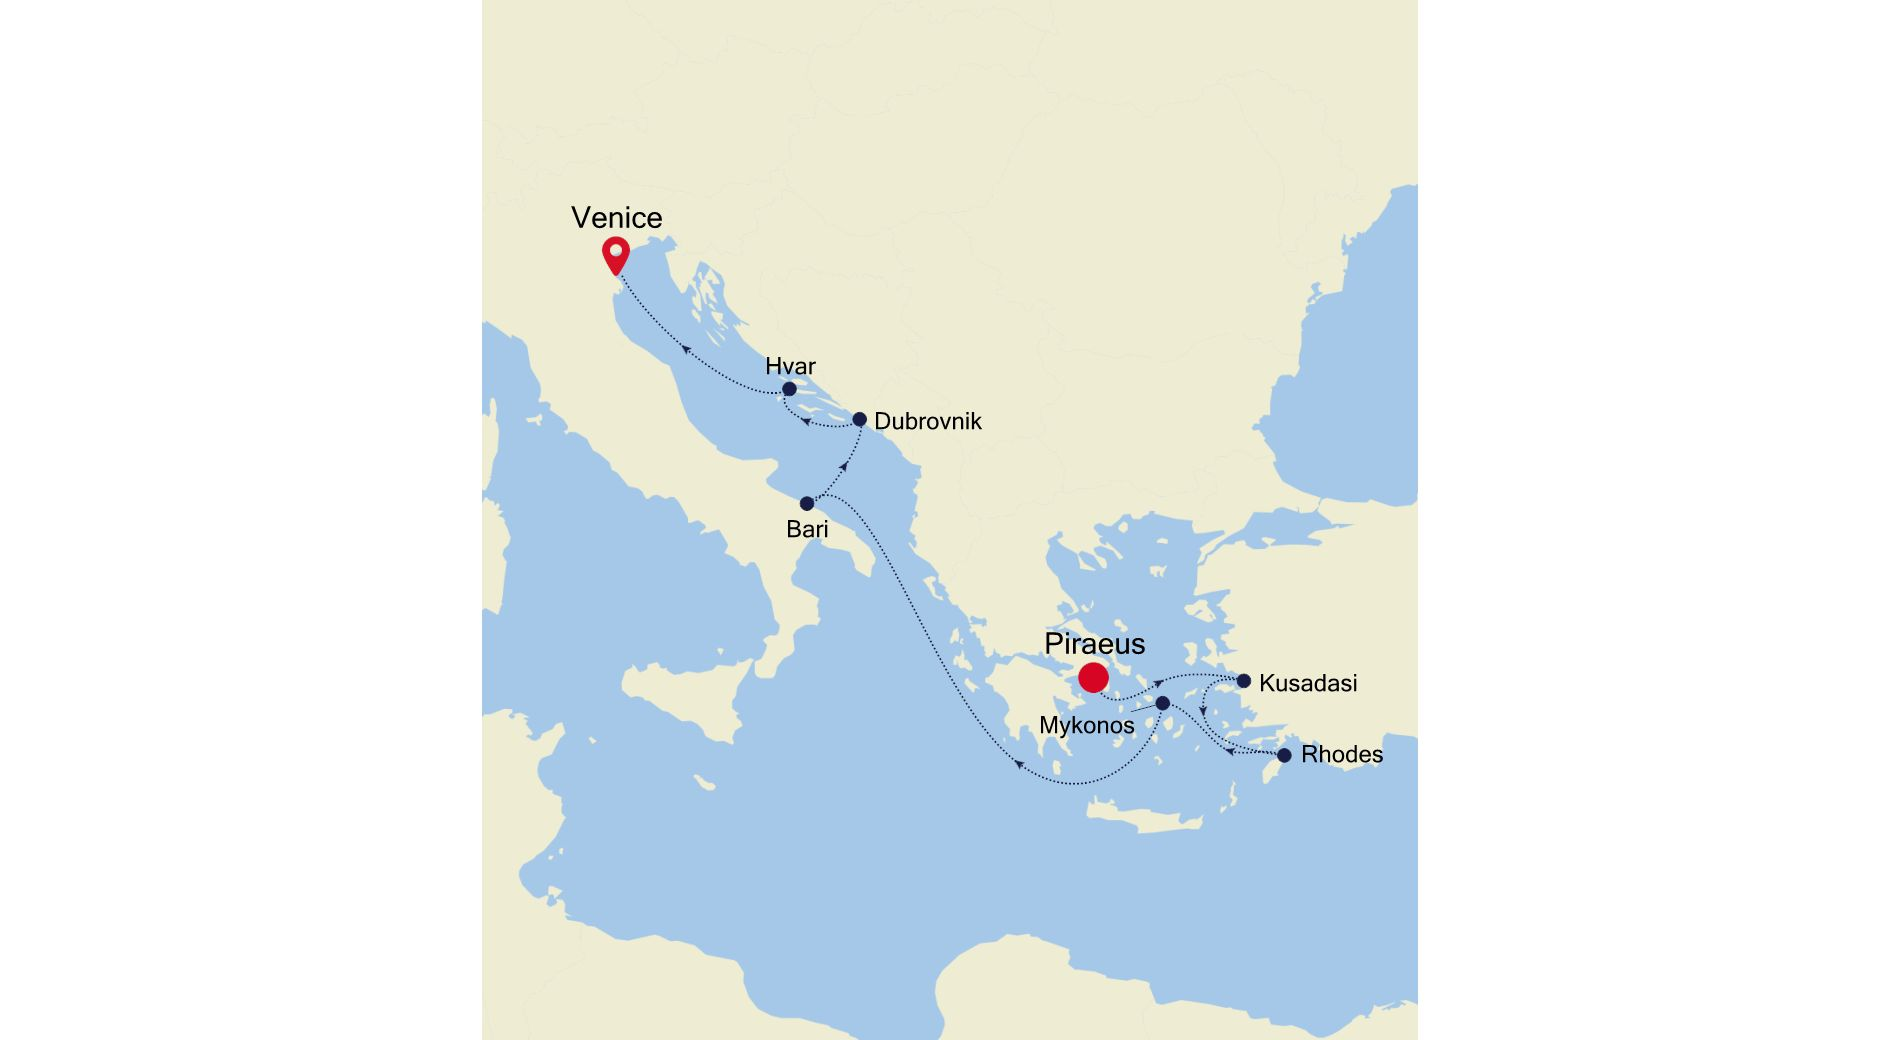 MO200923009 - Athens to Venice